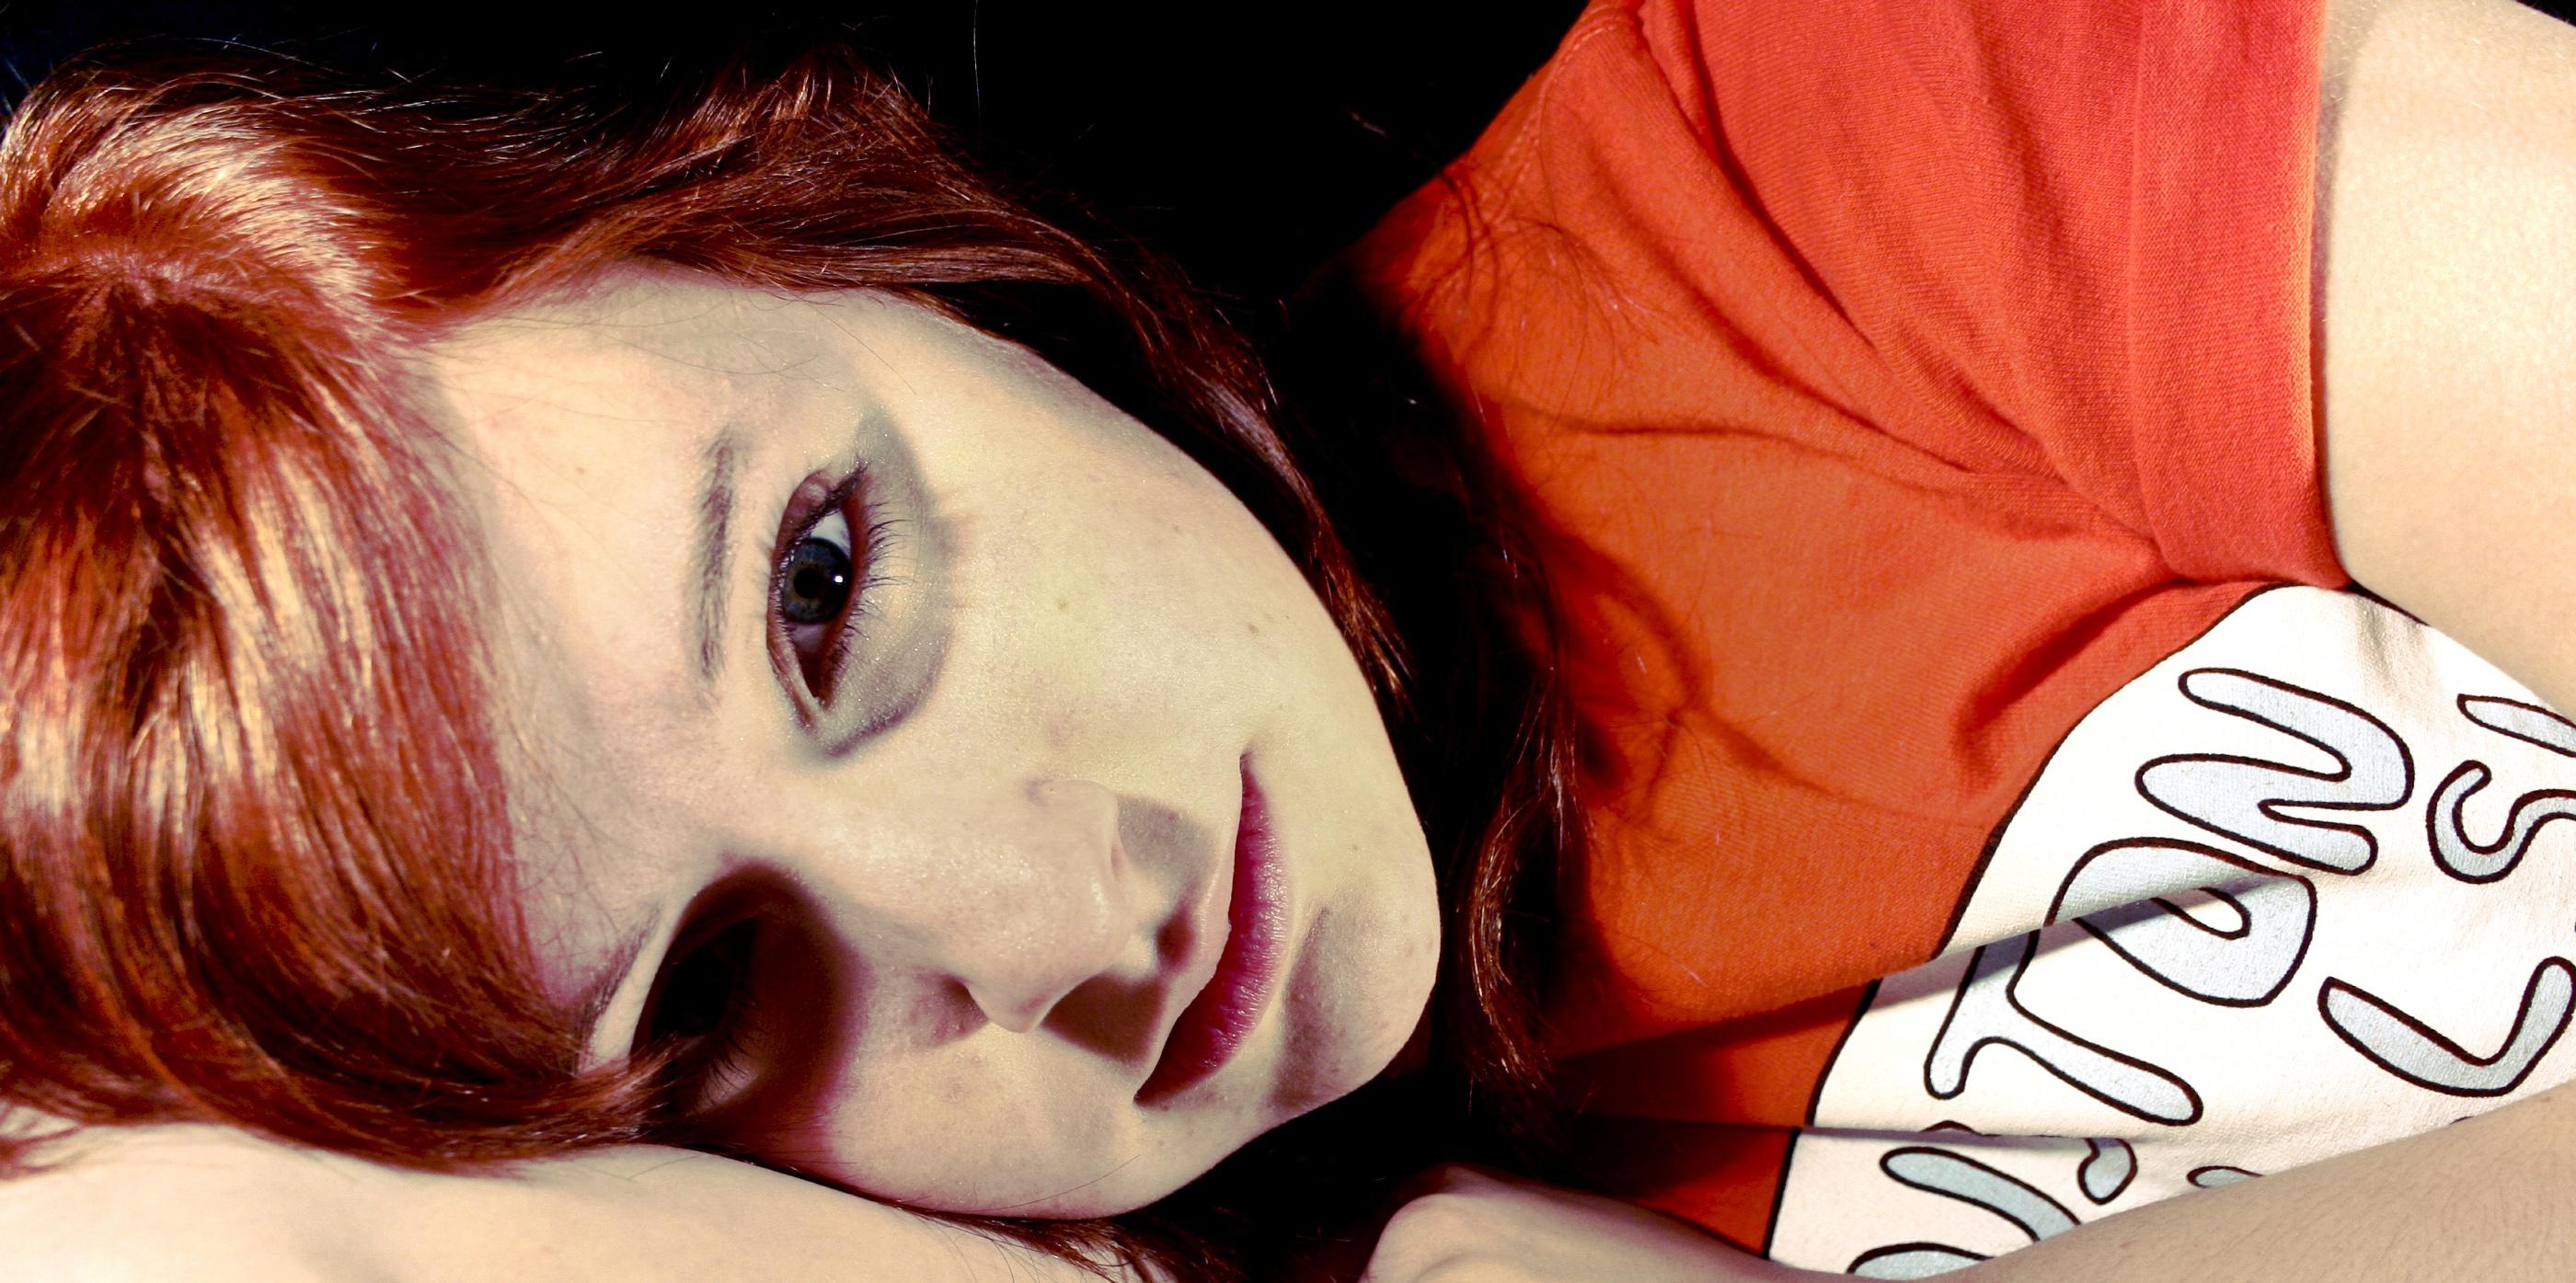 blog wakeful teen